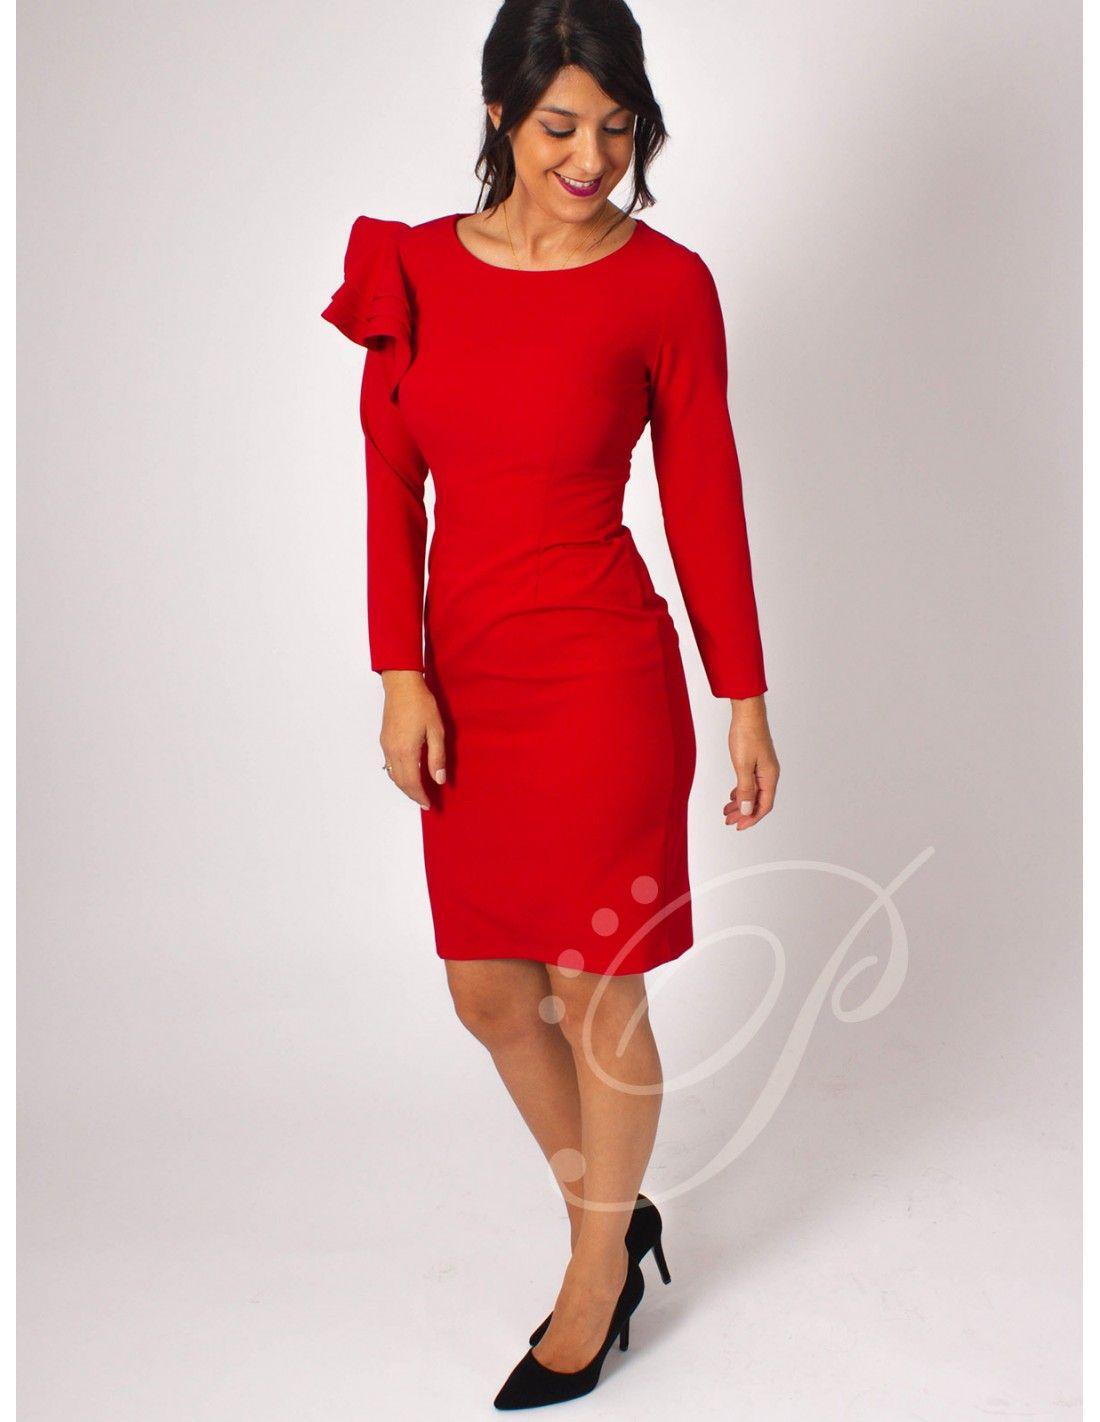 Vestido Aveyron - Vestido de corte midi en color rojo. Escote redondo.  Manga larga 8960a038fe58